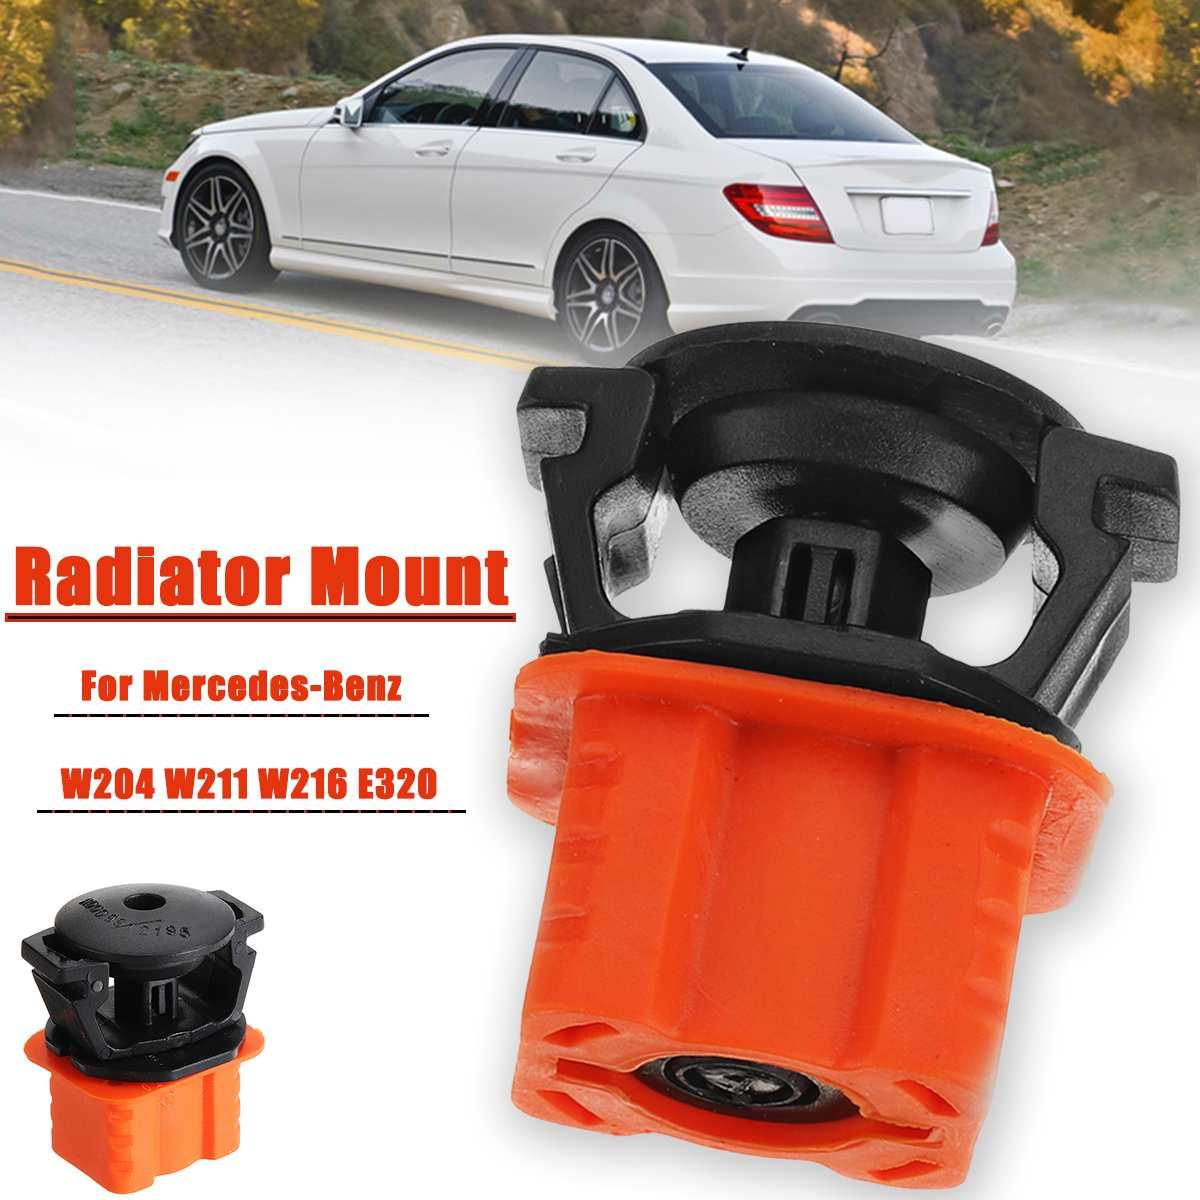 La montura del radiador Kit Pin encaja para Benz W204 W211 W216 E320 1695040114, 2115040059